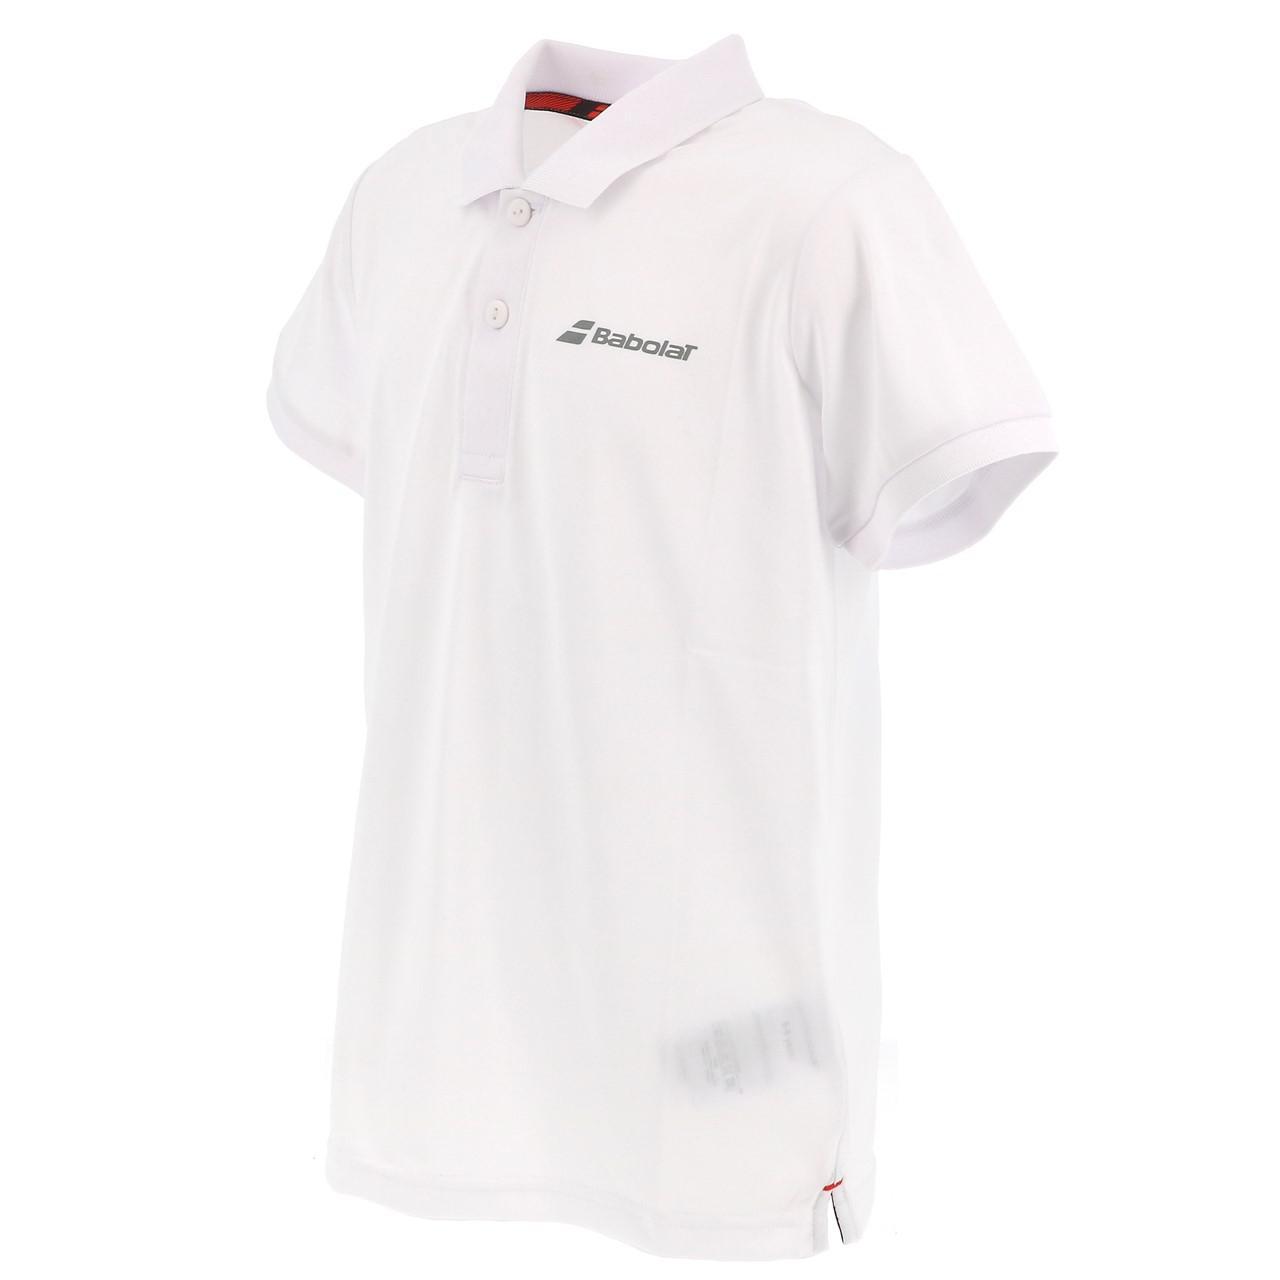 Polo-Von-Tennis-Babolat-Polo-Kind-Weiss-Weiss-71214-Neu Indexbild 4